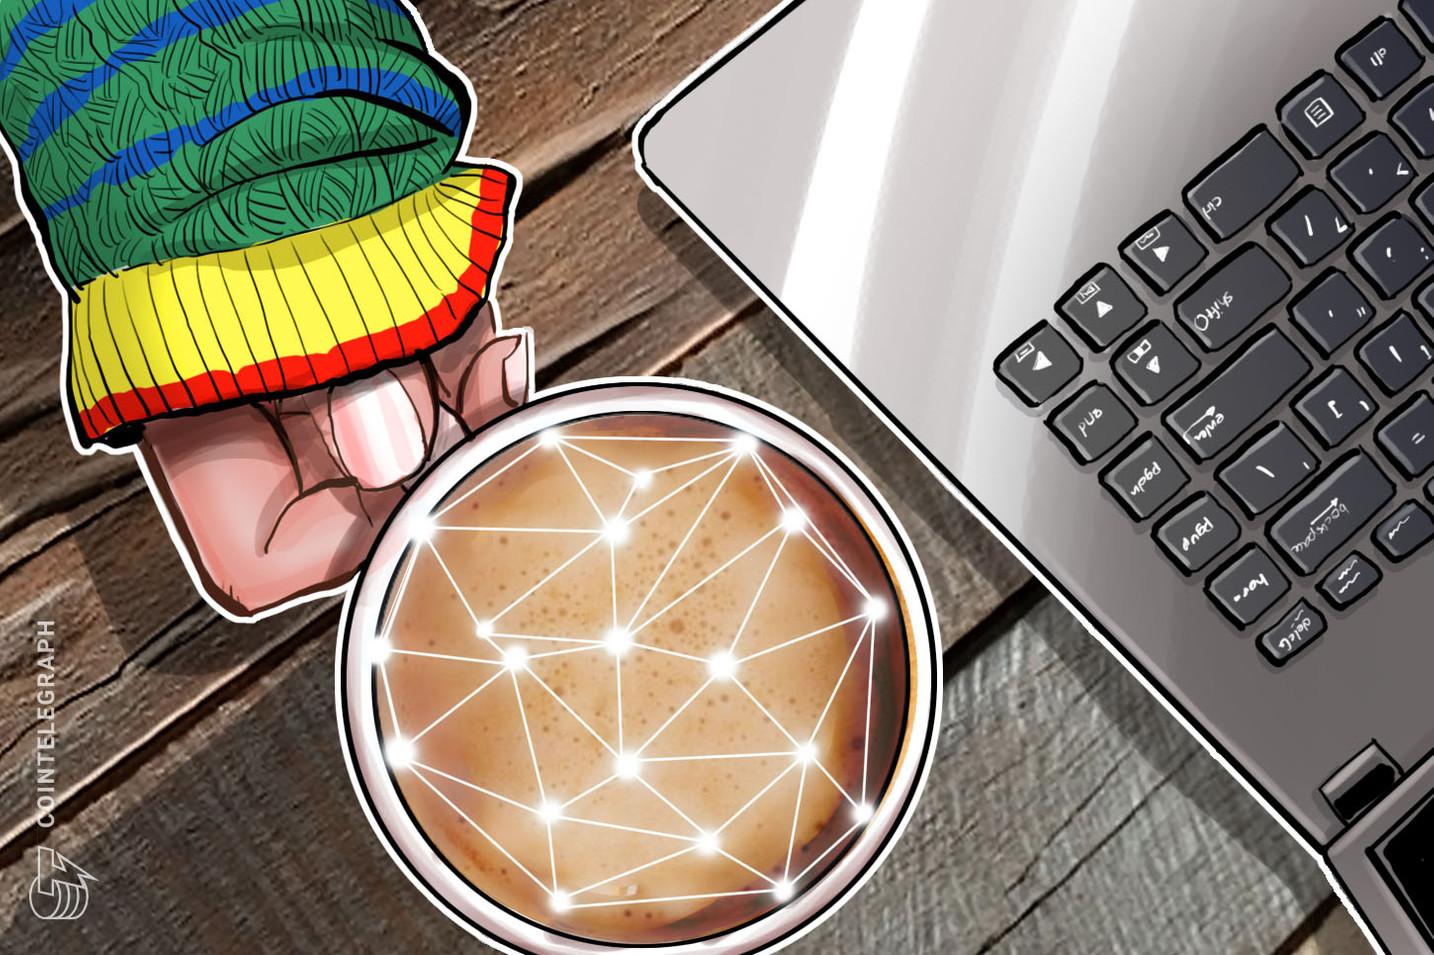 Starbucks Working With Microsoft for Blockchain-Based Coffee Tracking Platform